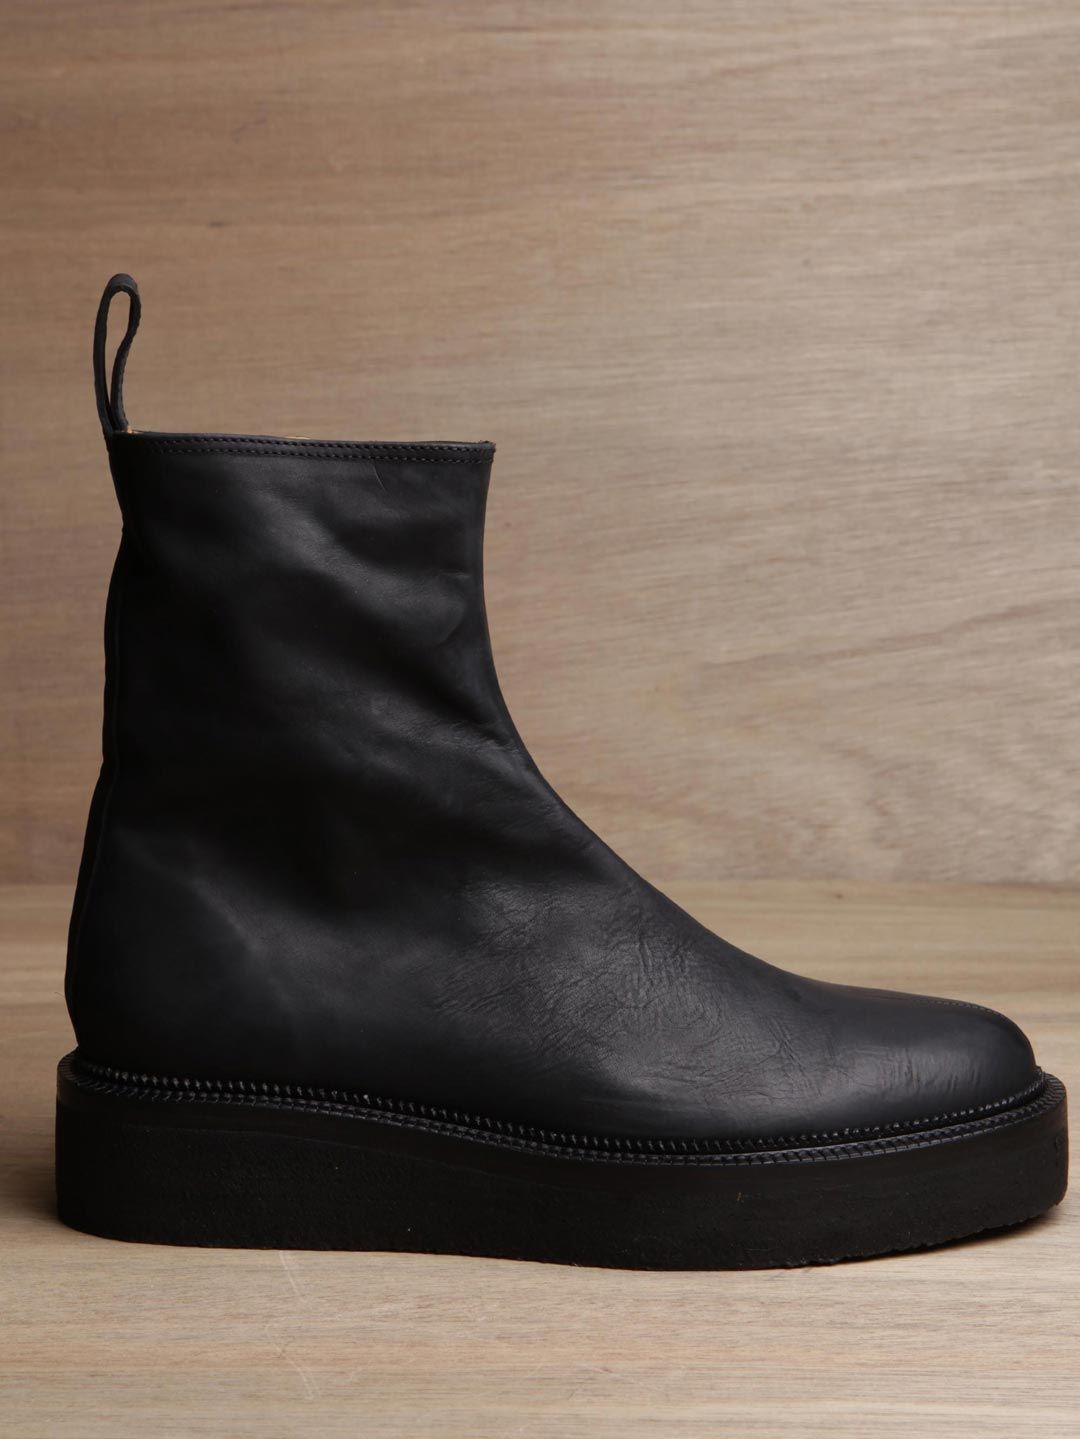 Damir Doma Creeper Boots